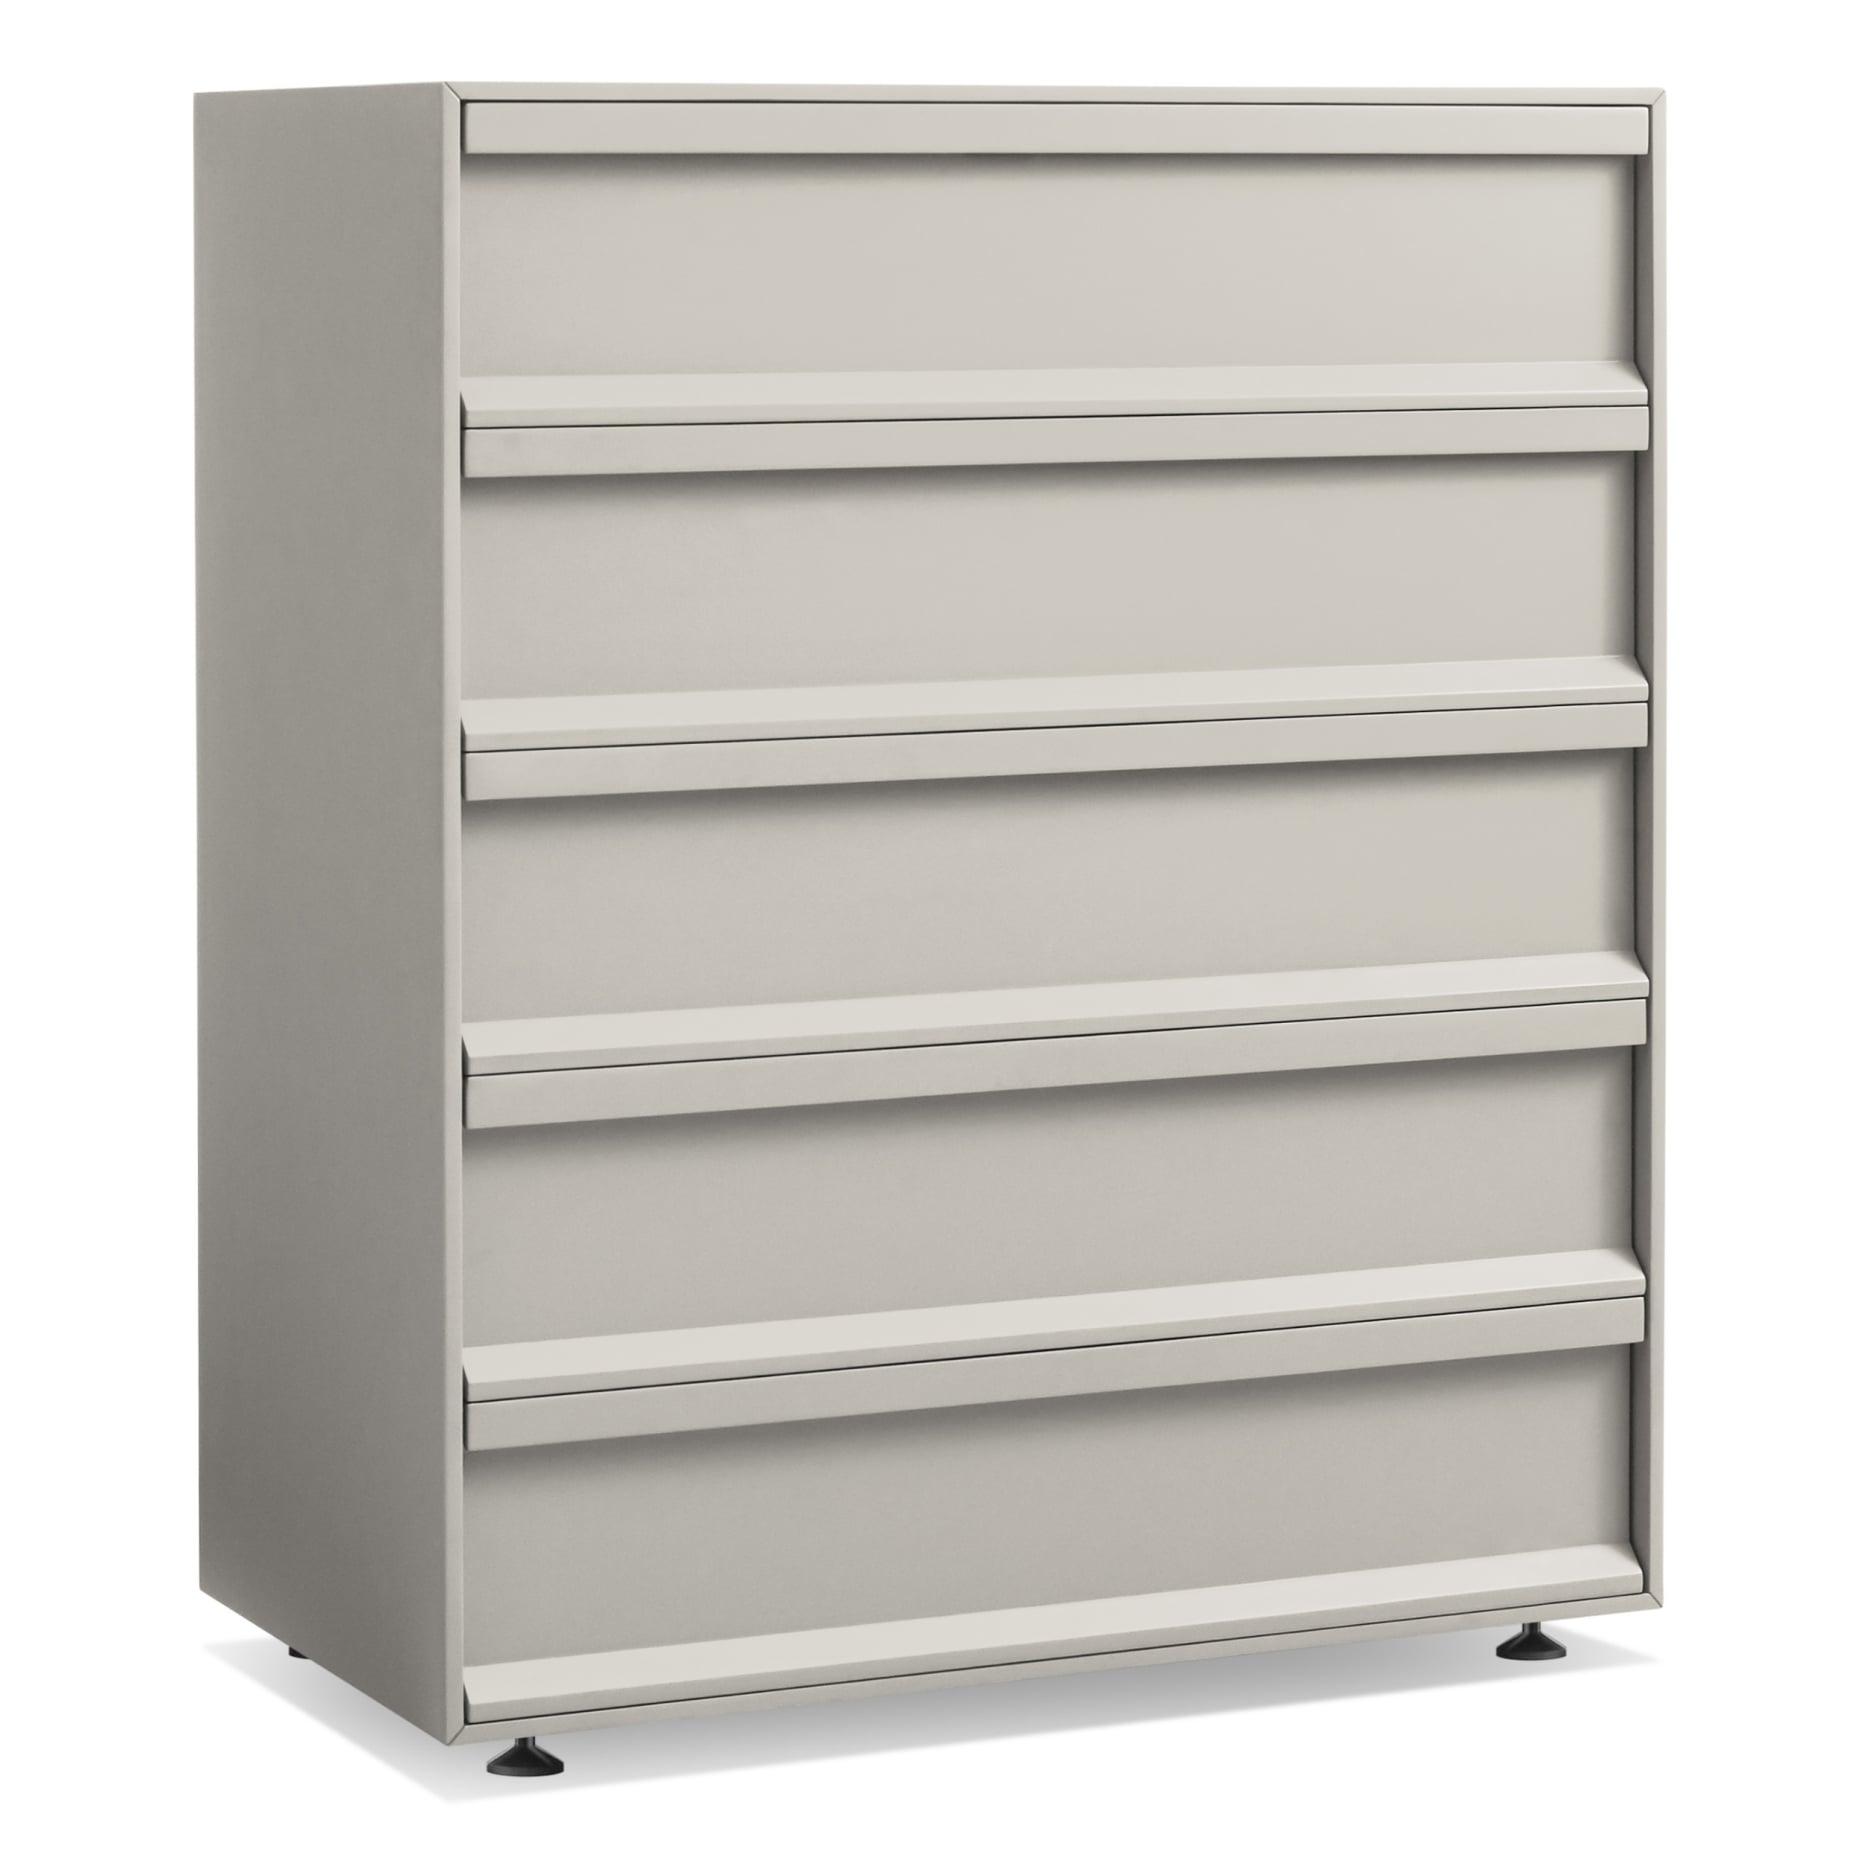 sc1 5drawr pt 34 superchoice 5 drawer dresser putty